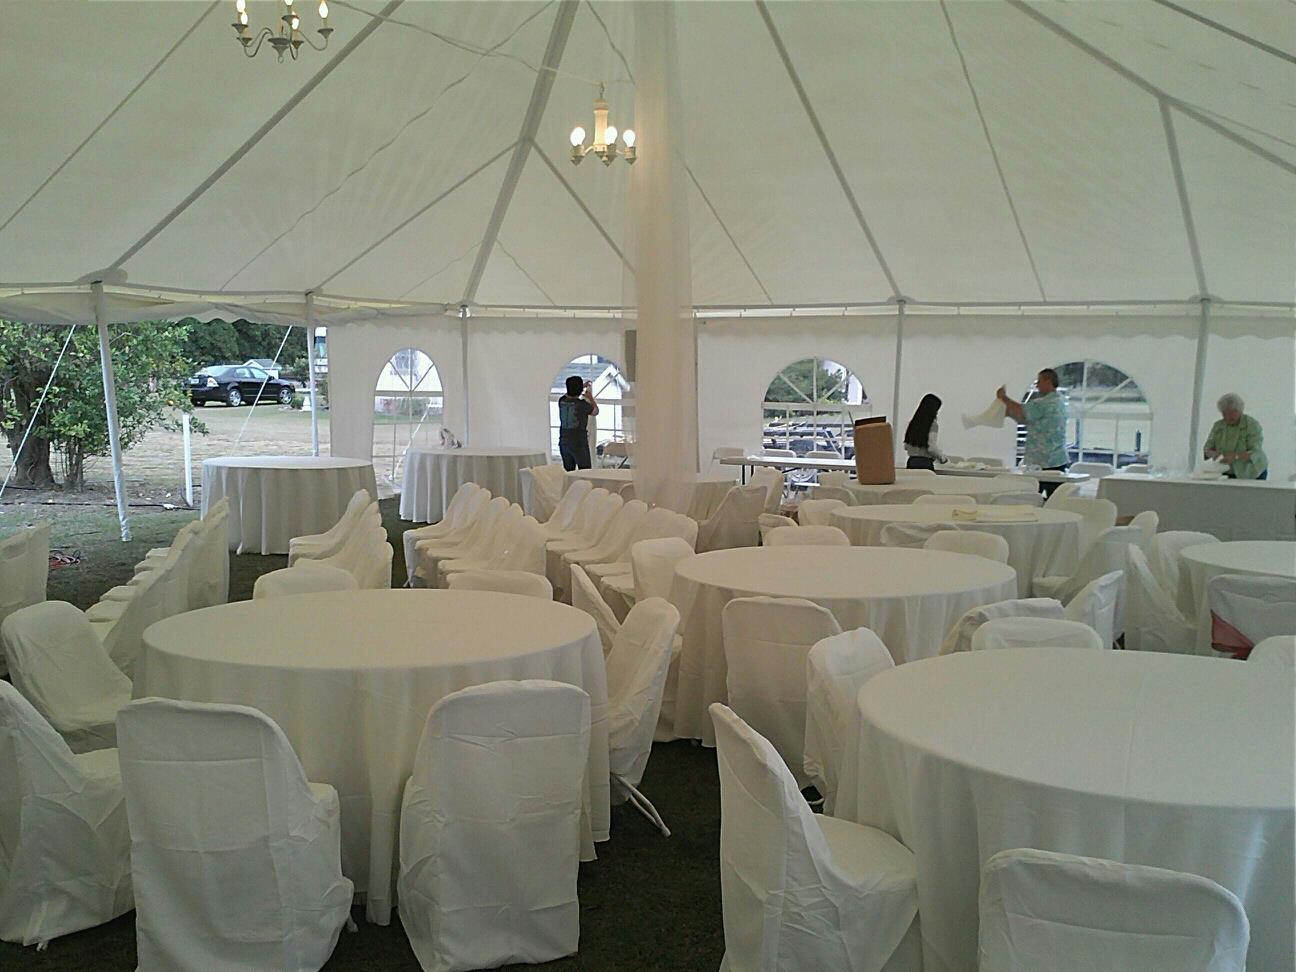 03 Jun 40X80 White wedding tent inside & 40X80 White wedding tent inside | Worldwide Tents